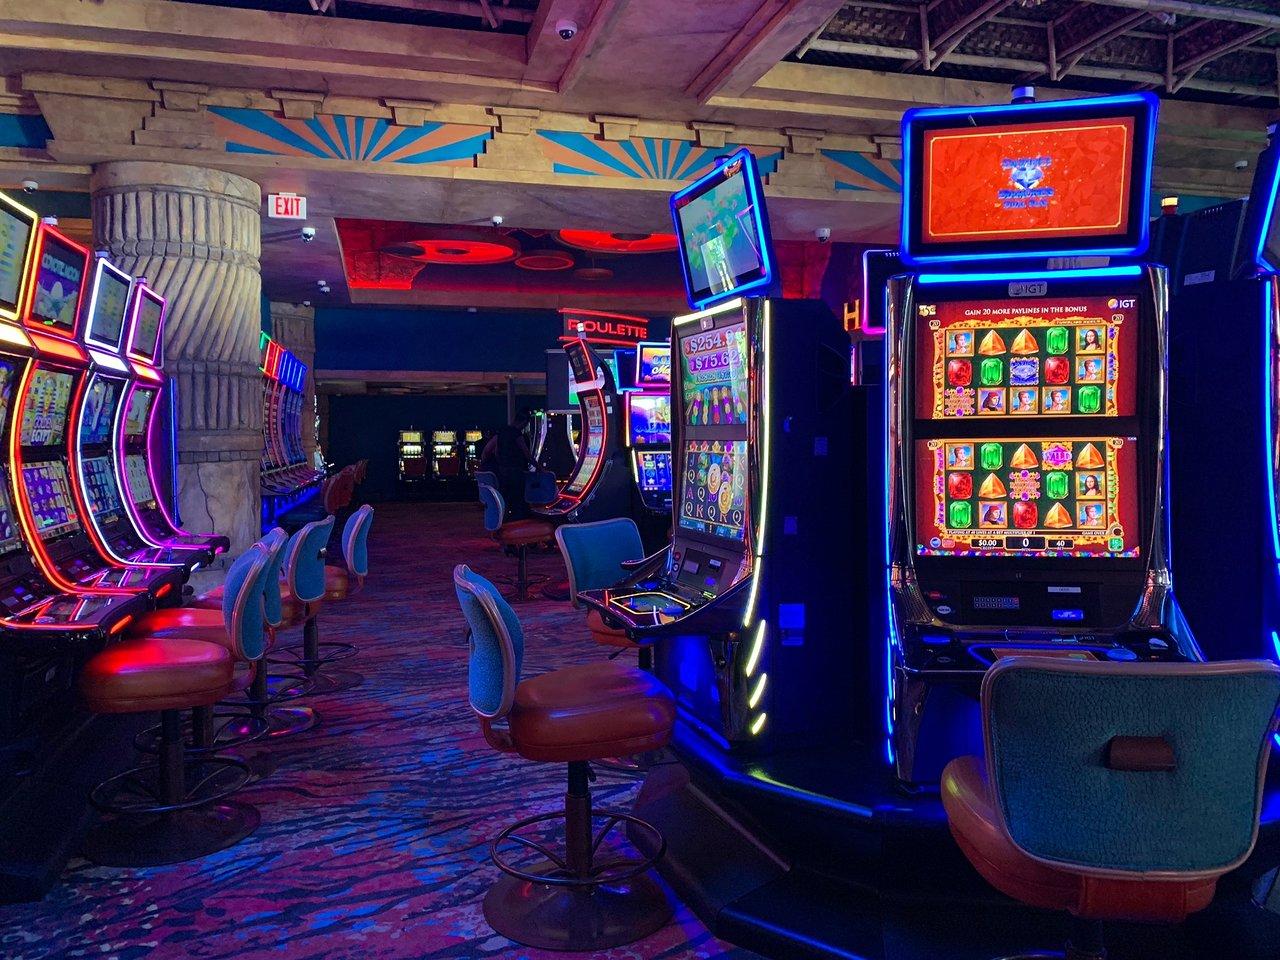 Best casinos online canada players